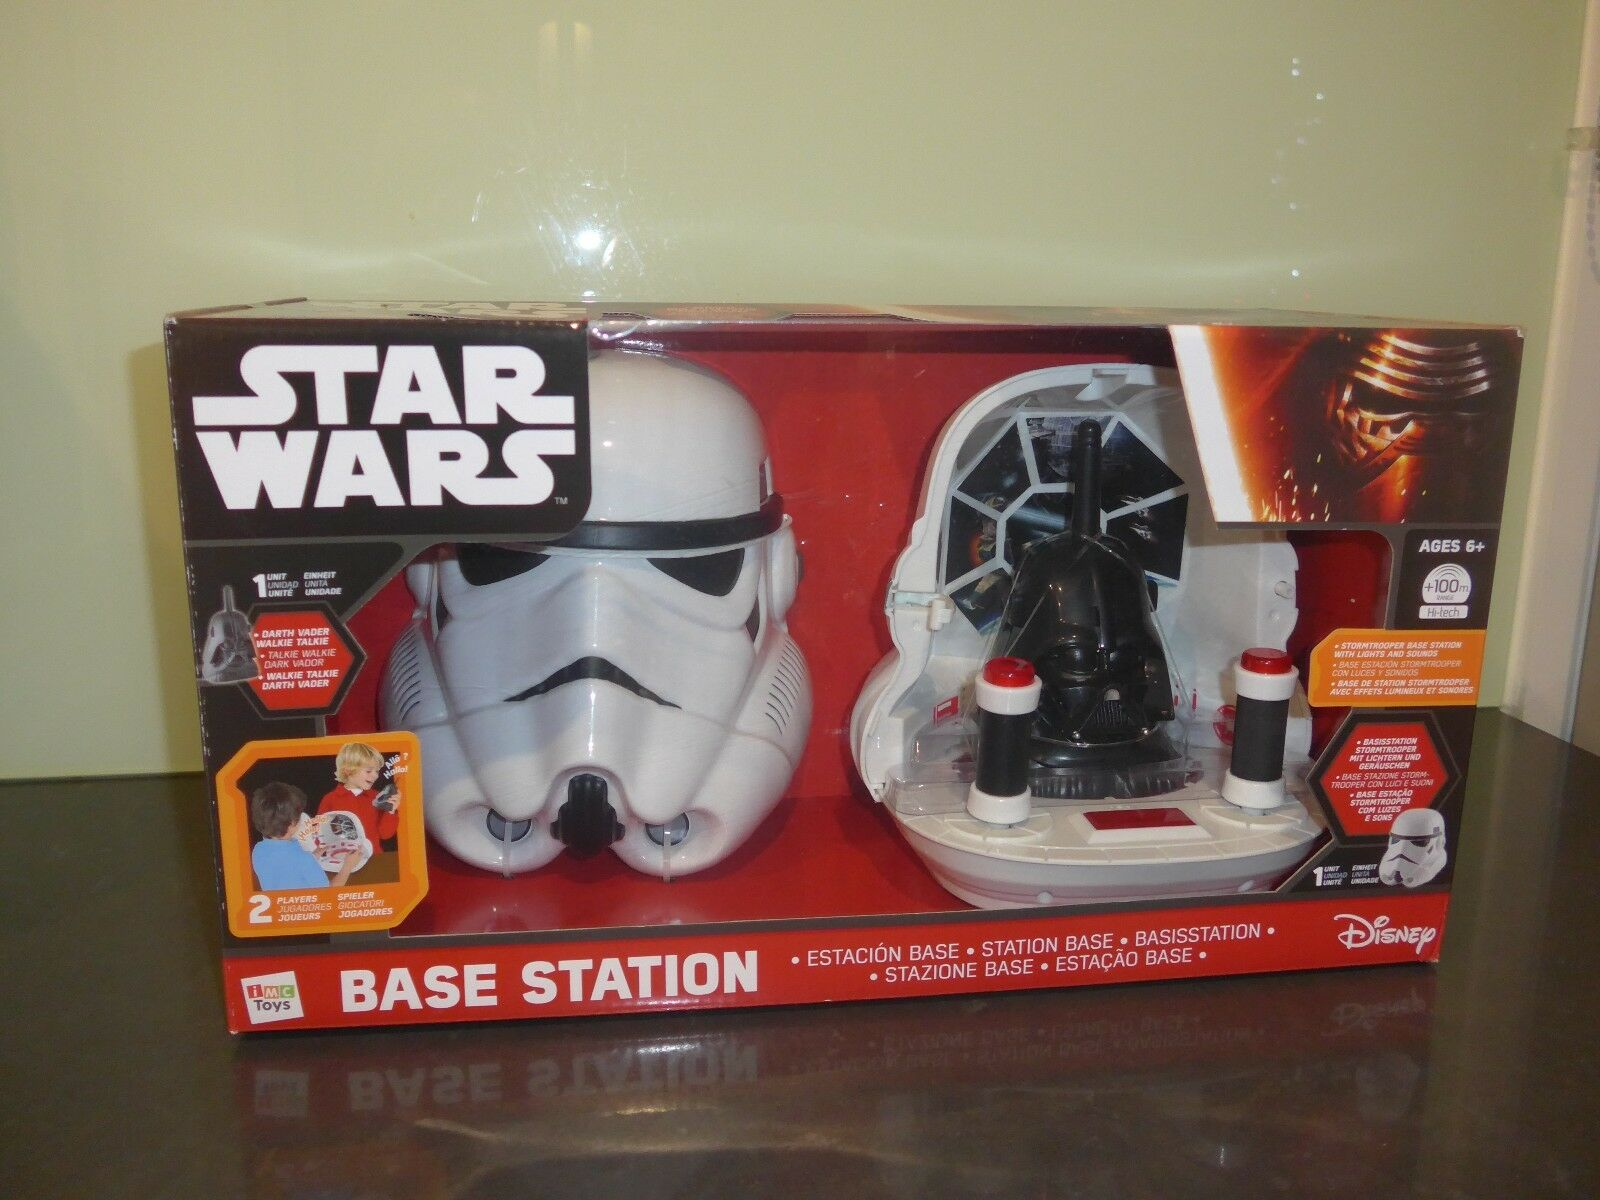 Star Wars Base Station for ages 6 +